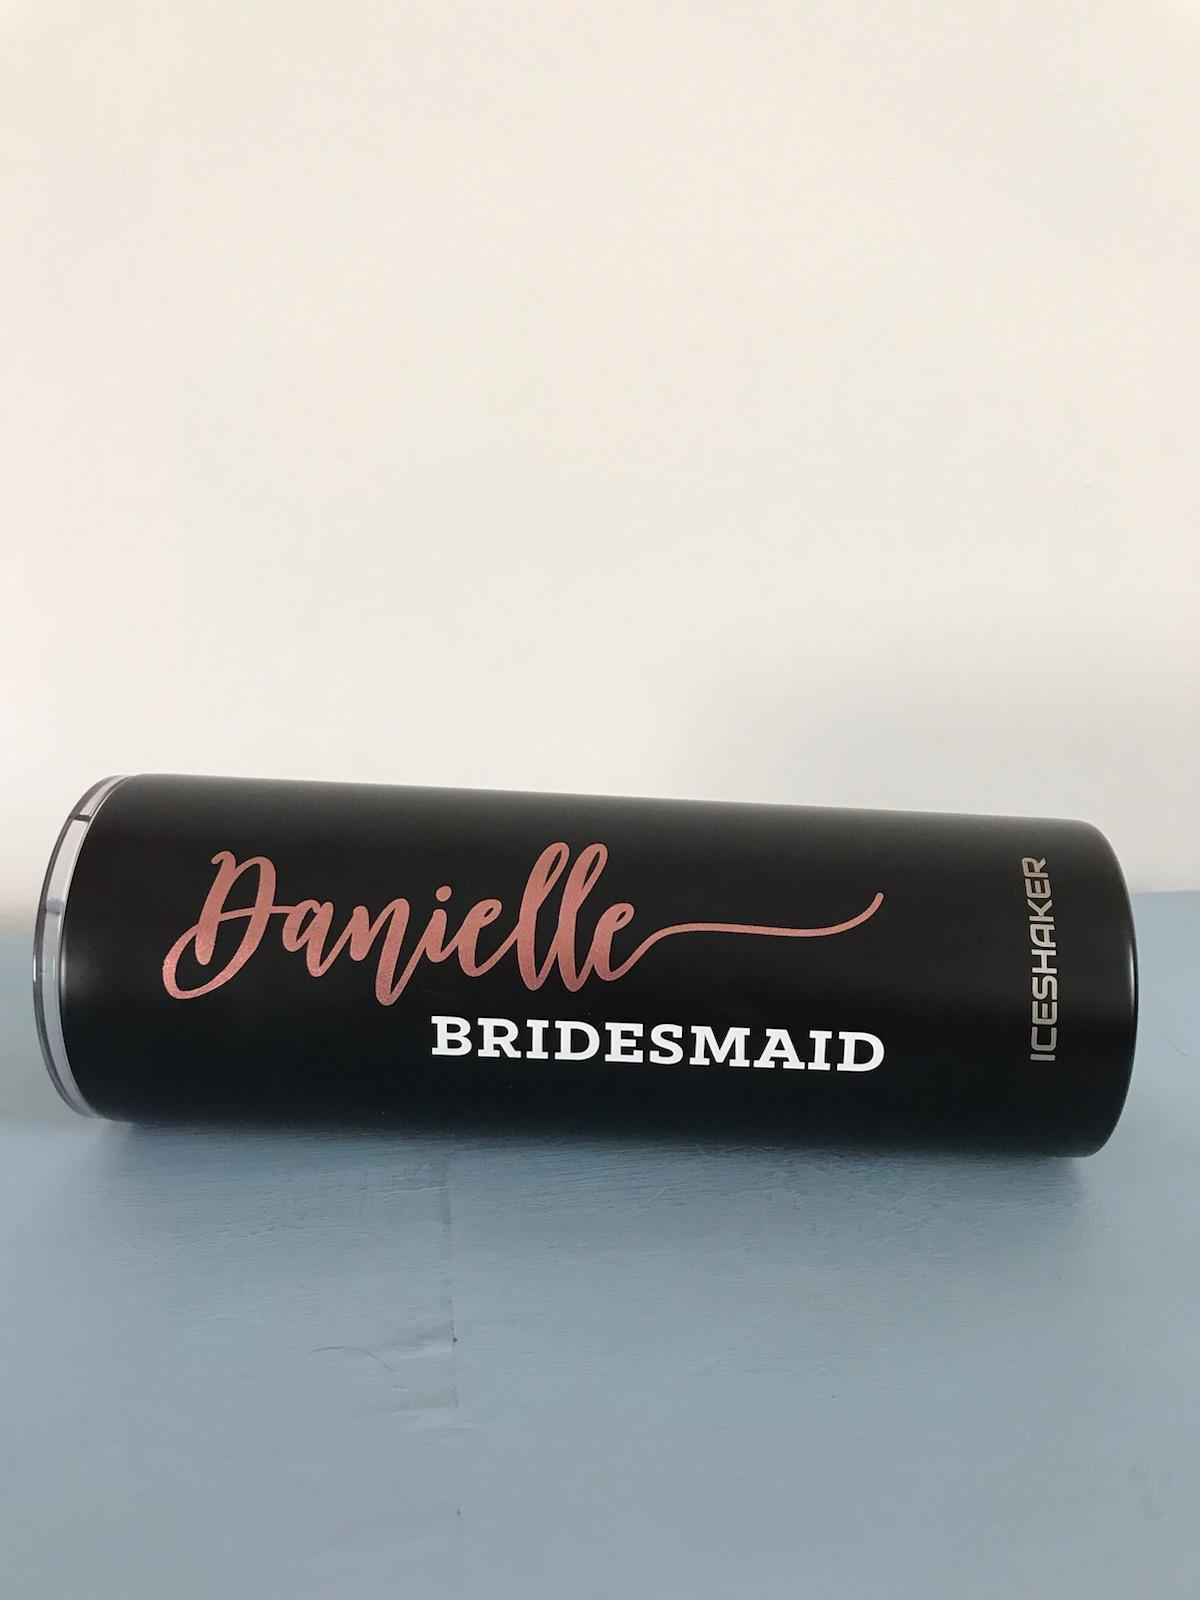 Customized bridesmaid gift idea